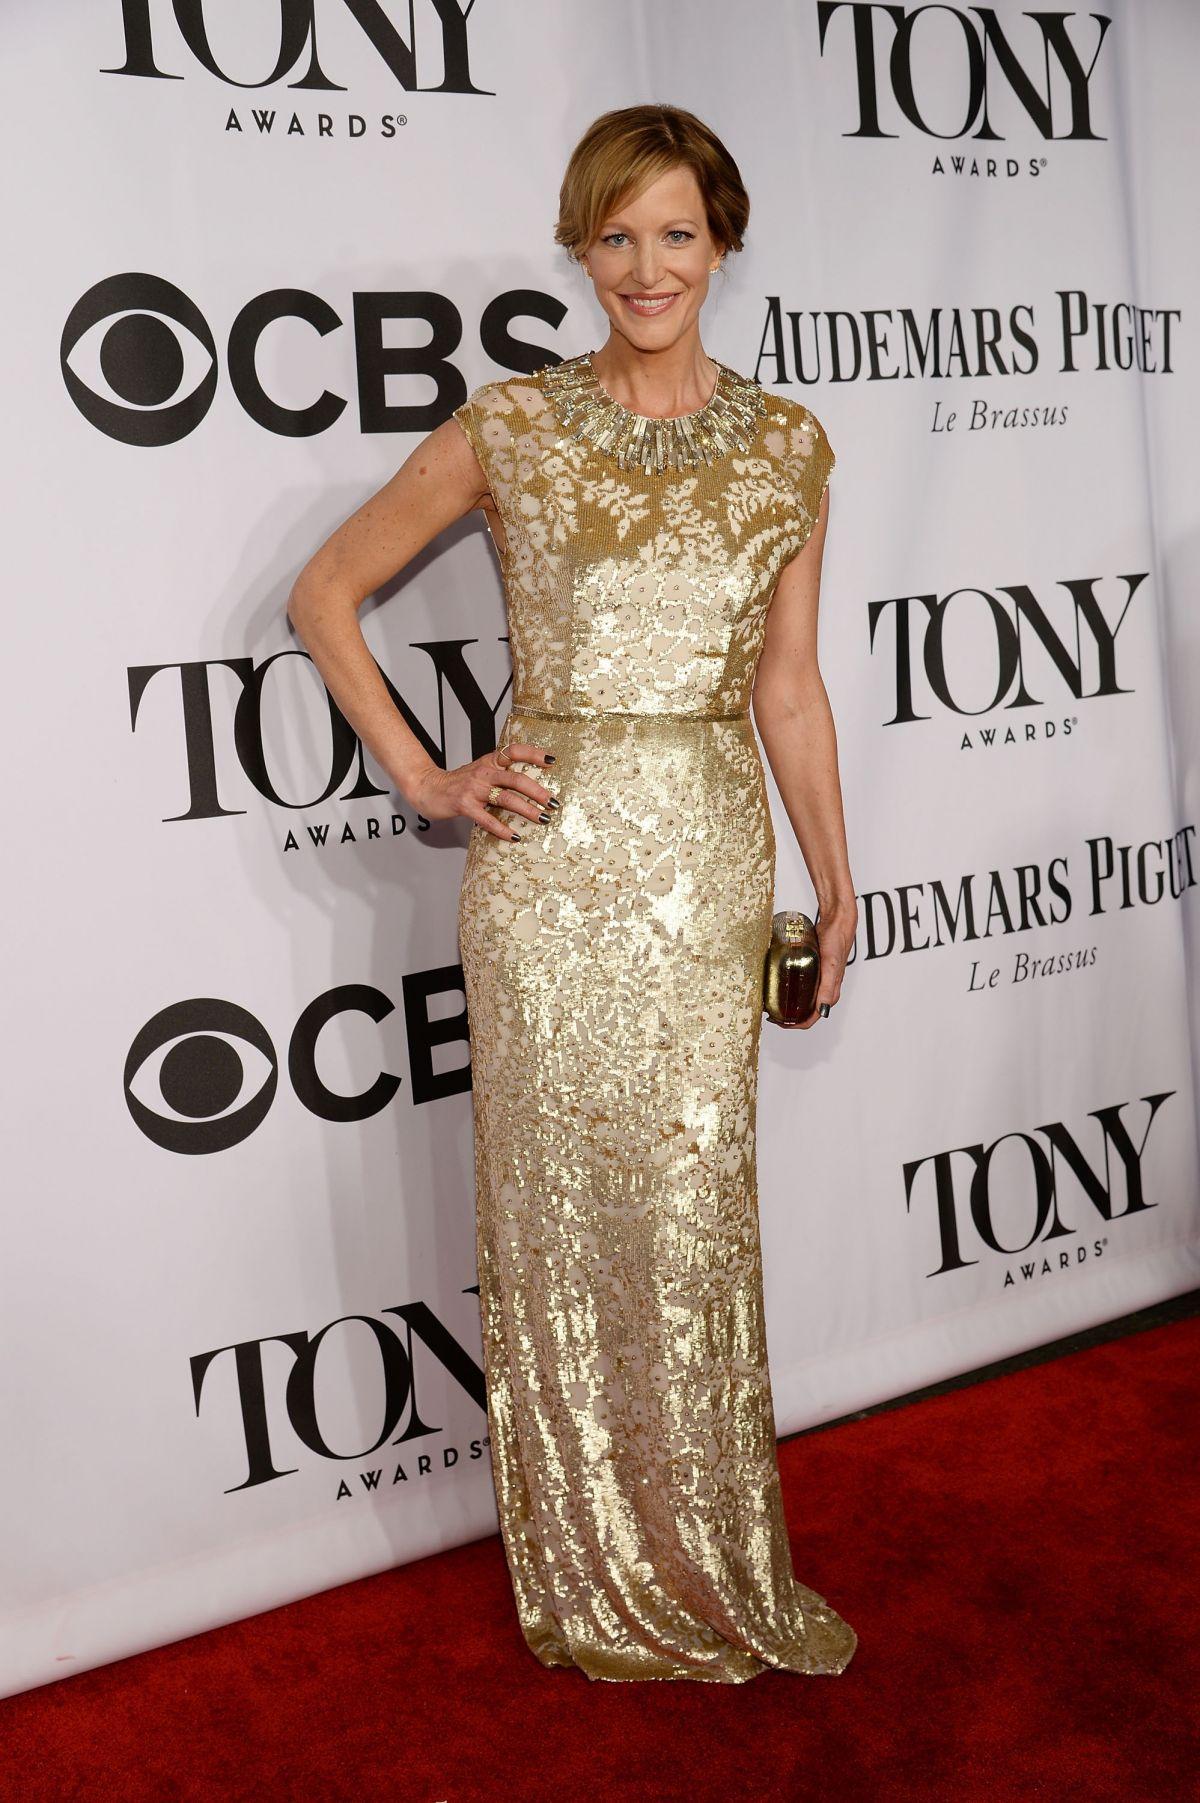 ANNA GUNN at 2014 Tony Awards in New York